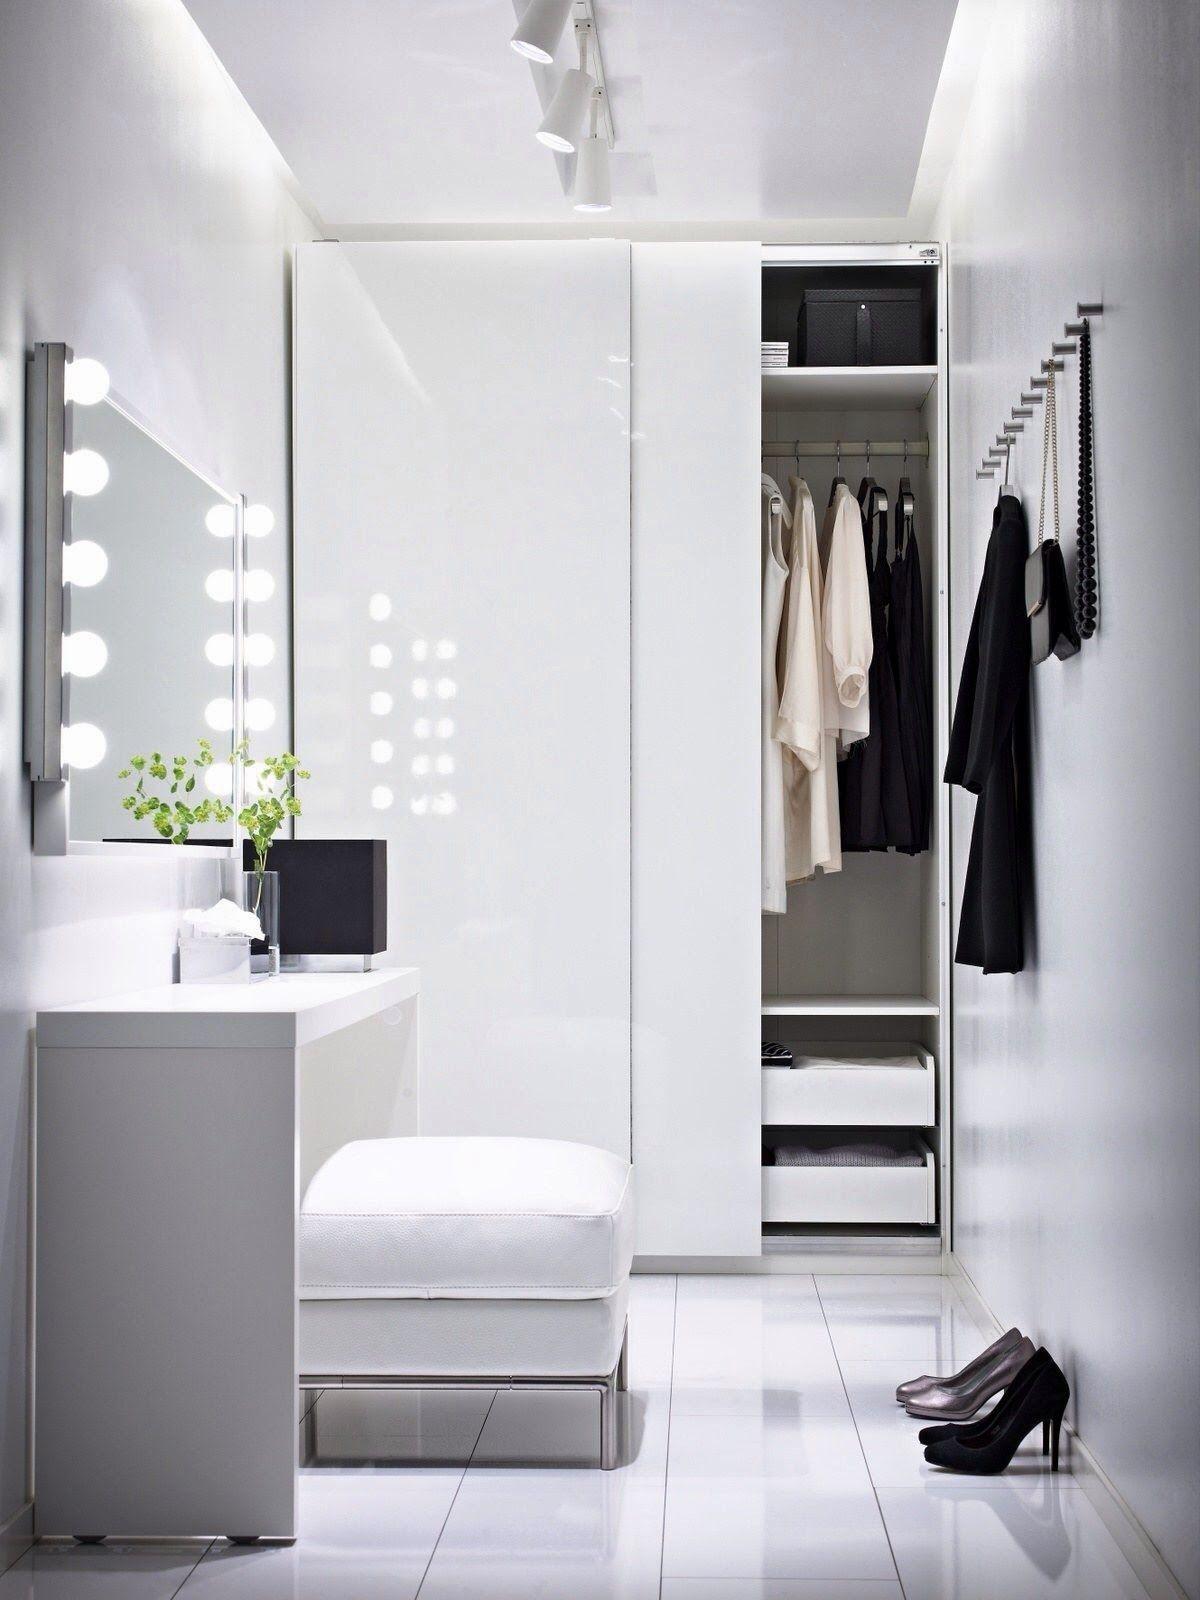 Practical Closet Lighting Ideas That Brighten Your Day | Condo ...